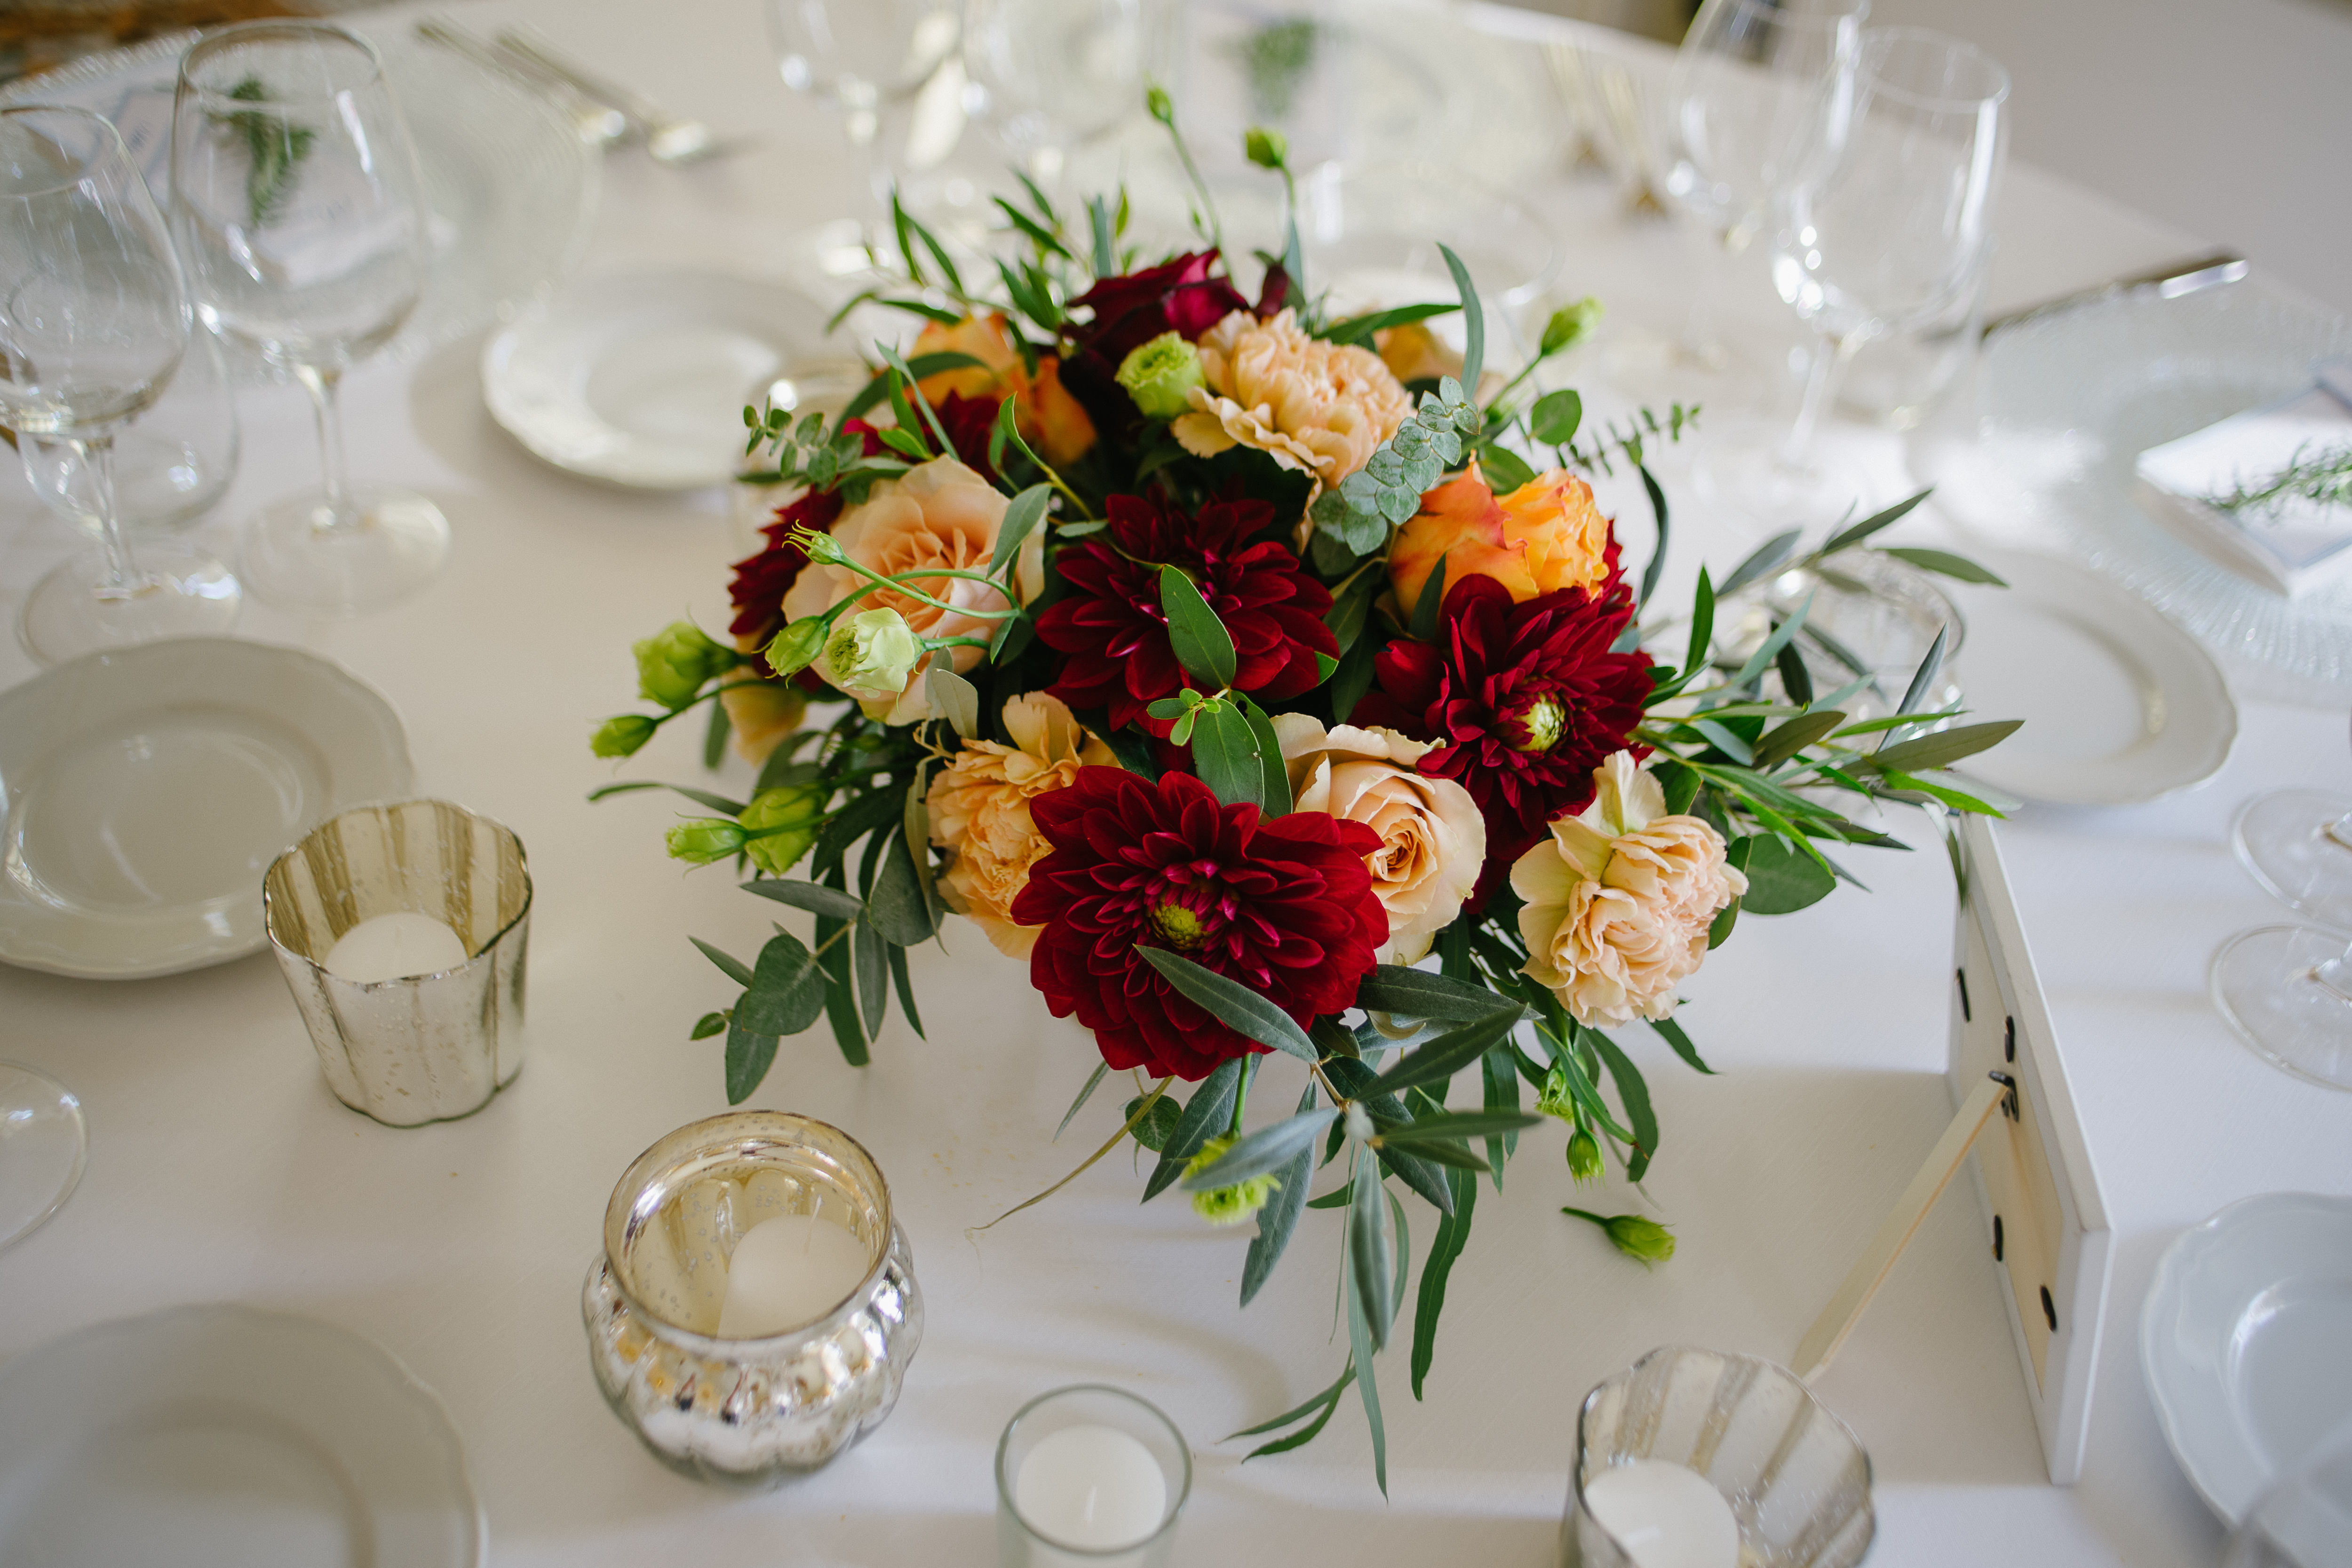 Centerpiece Ceremony in Lake Como by Italian Wedding Designer